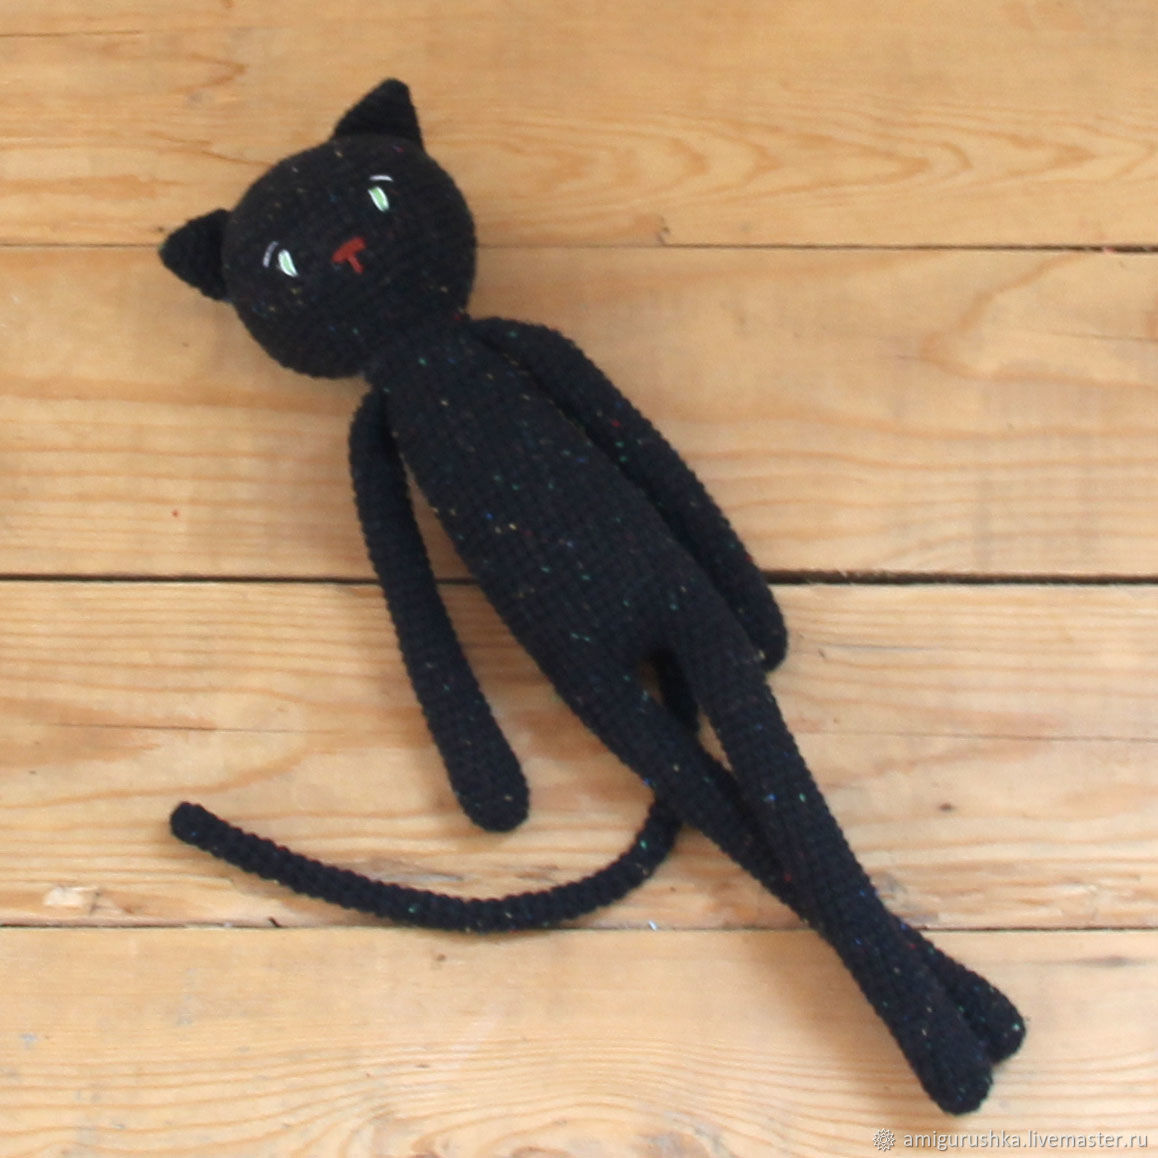 Crochet plush cat Baby crochet toy Amigurumi cat Soft crochet toy Cat toy  baby Crochet cat | 1158x1158